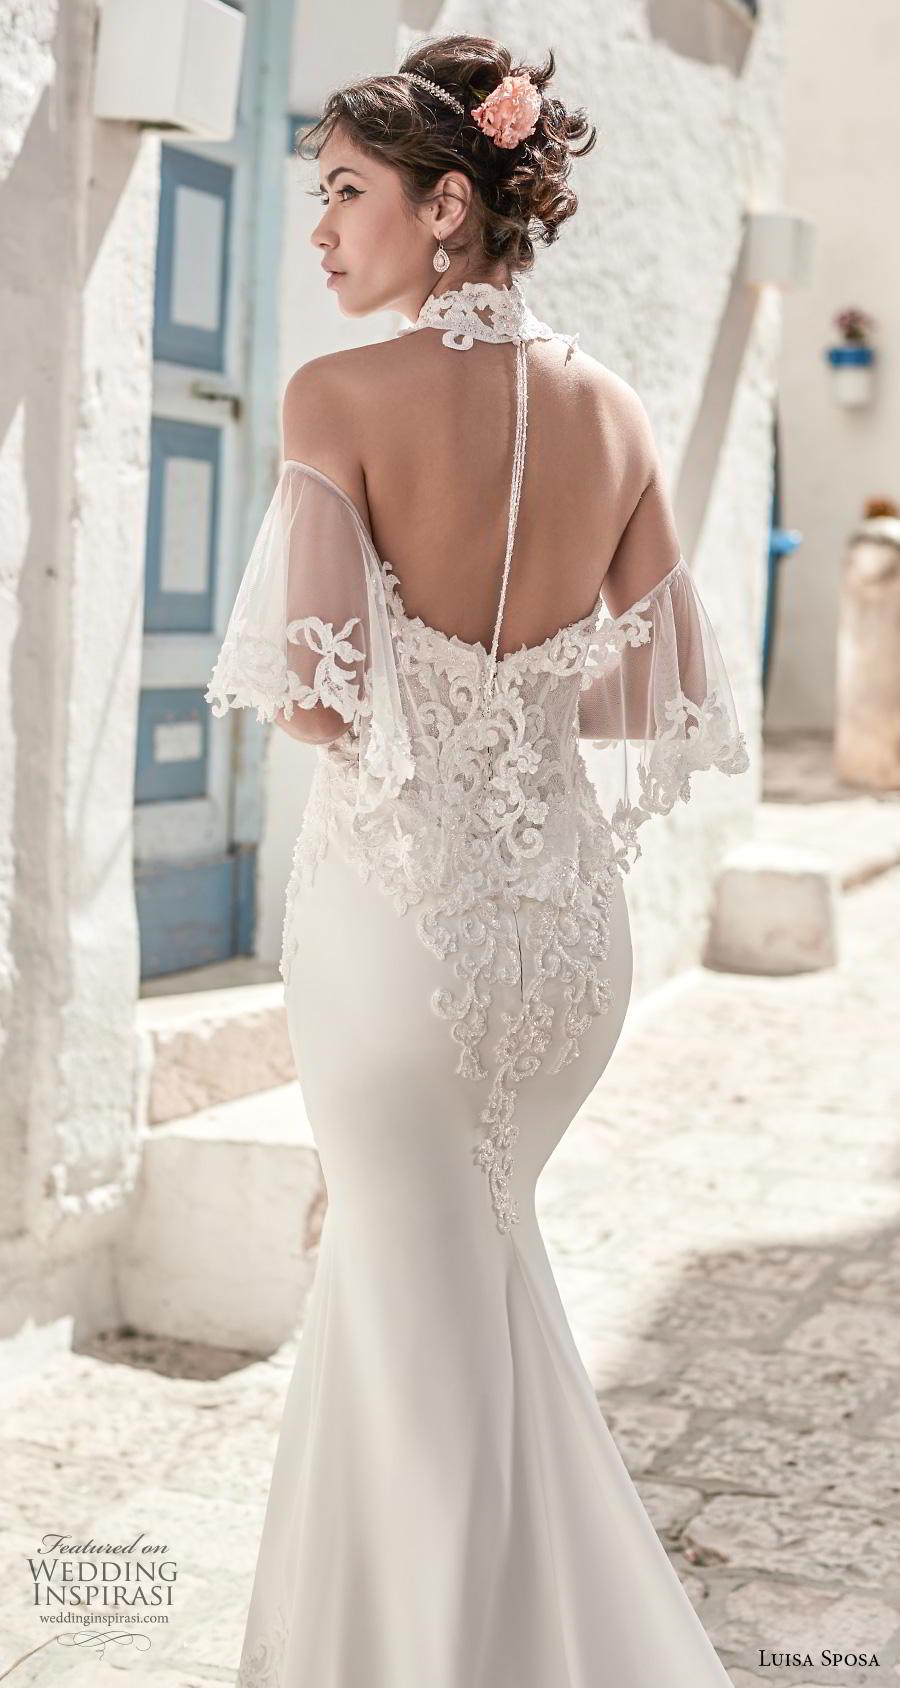 luisa sposa 2020 bridal cold shoulder illusion halter neck sweetheart neckline heavily embellished bodice fit and flare wedding dress sheer button back chapel train (18) zbv